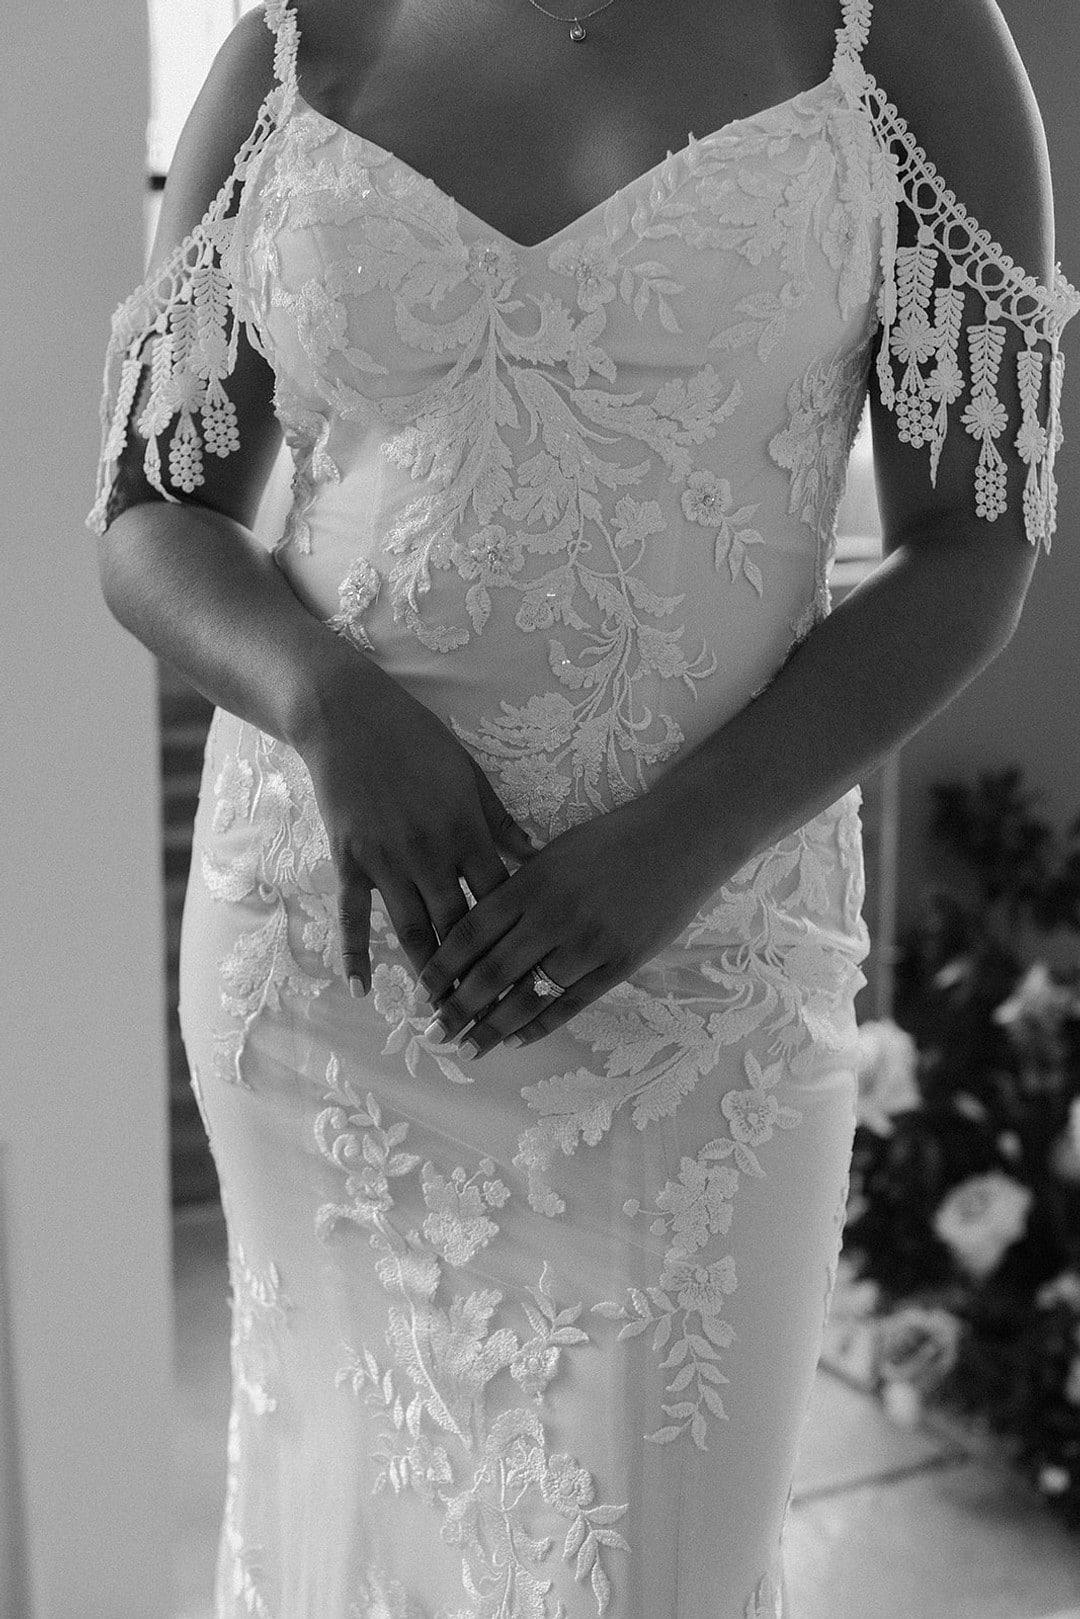 a close up of the bride's wedding dress for the urban loft wedding inspiration shoot.